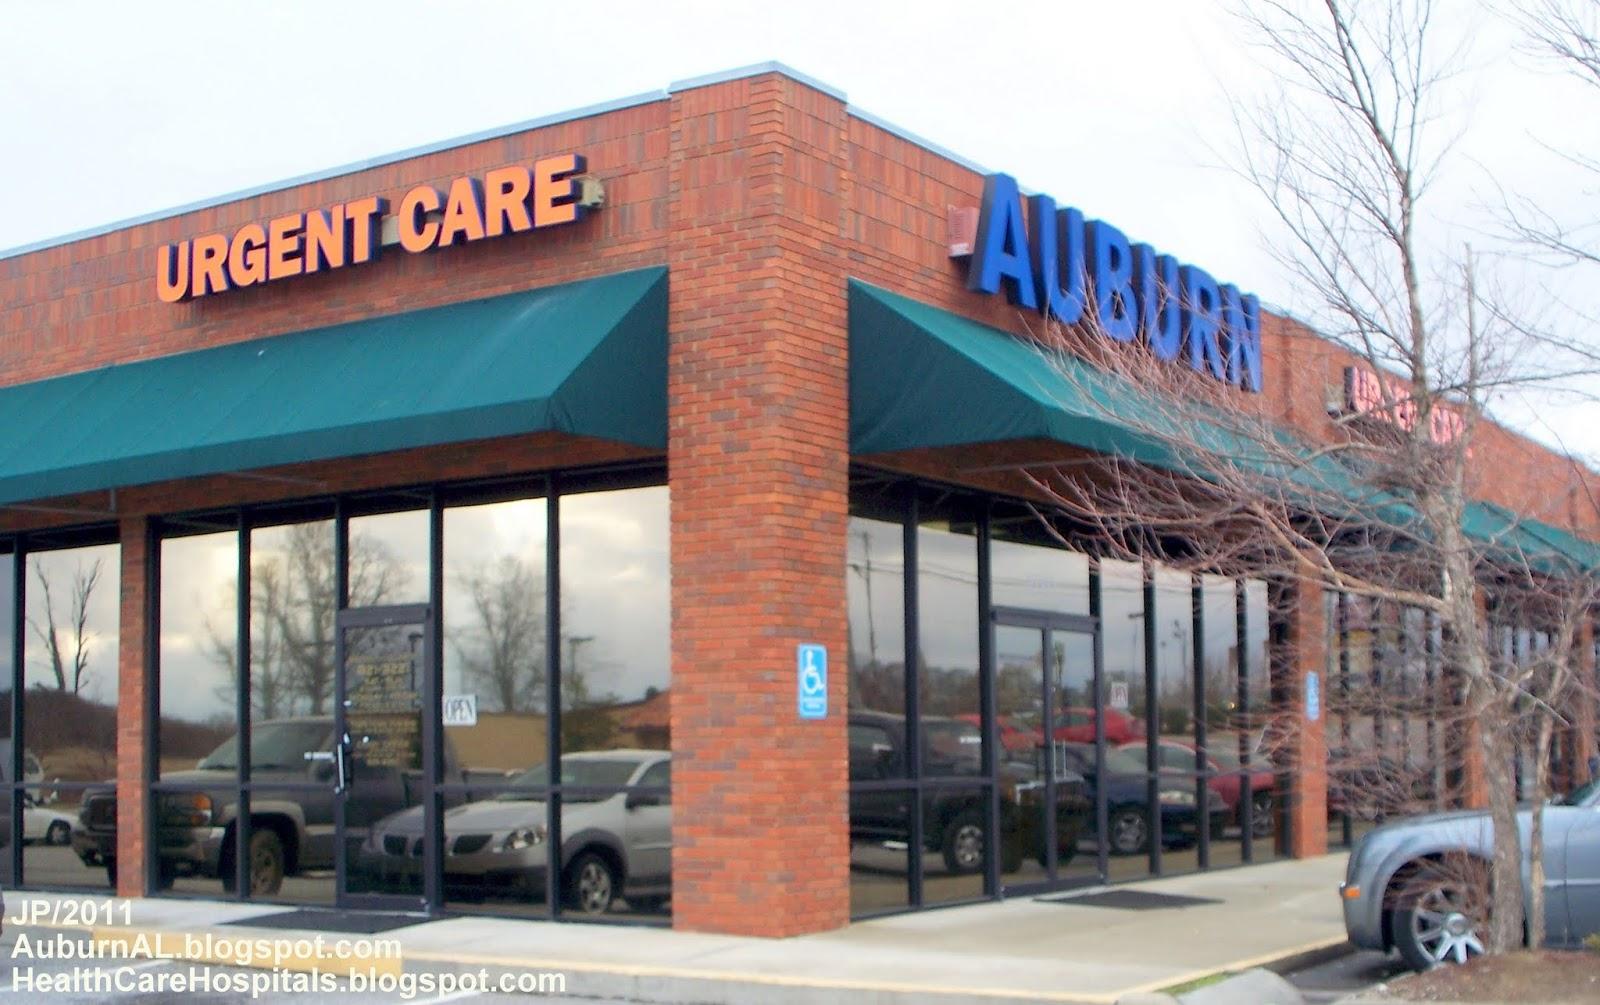 Alabama lee county salem - Urgent Care Auburn Alabama Urgent Care Medical Health Clinic Auburn Opelika Al Lee County Doctors